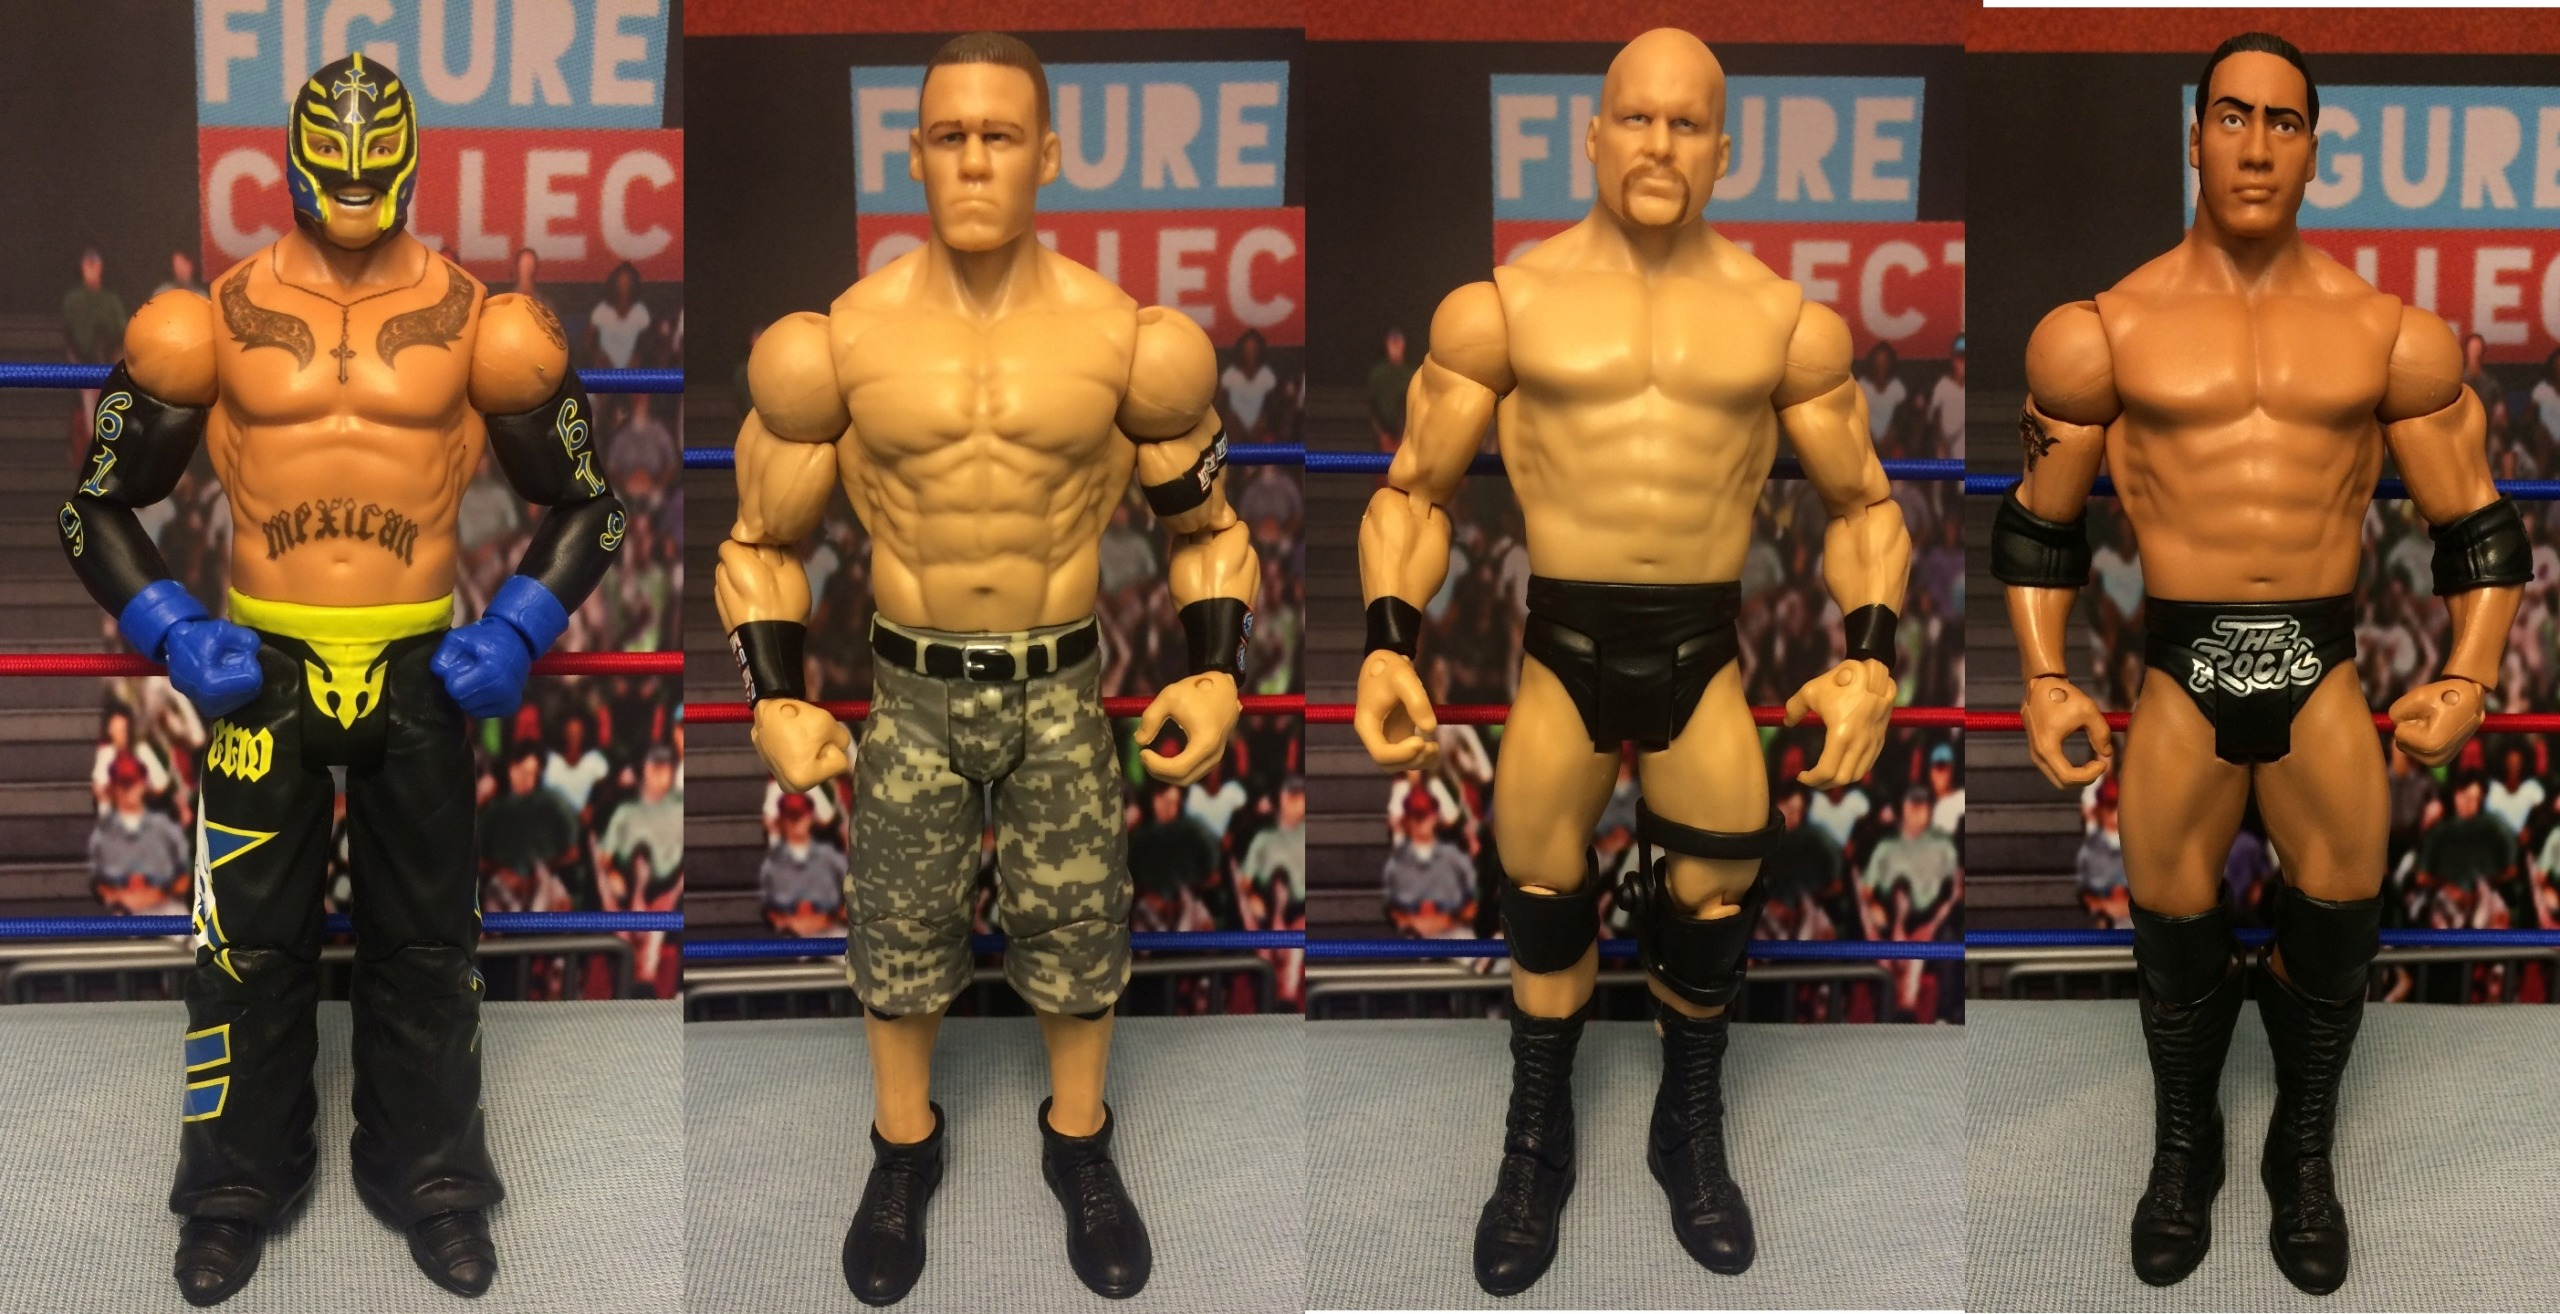 John Cena (87) Tr291